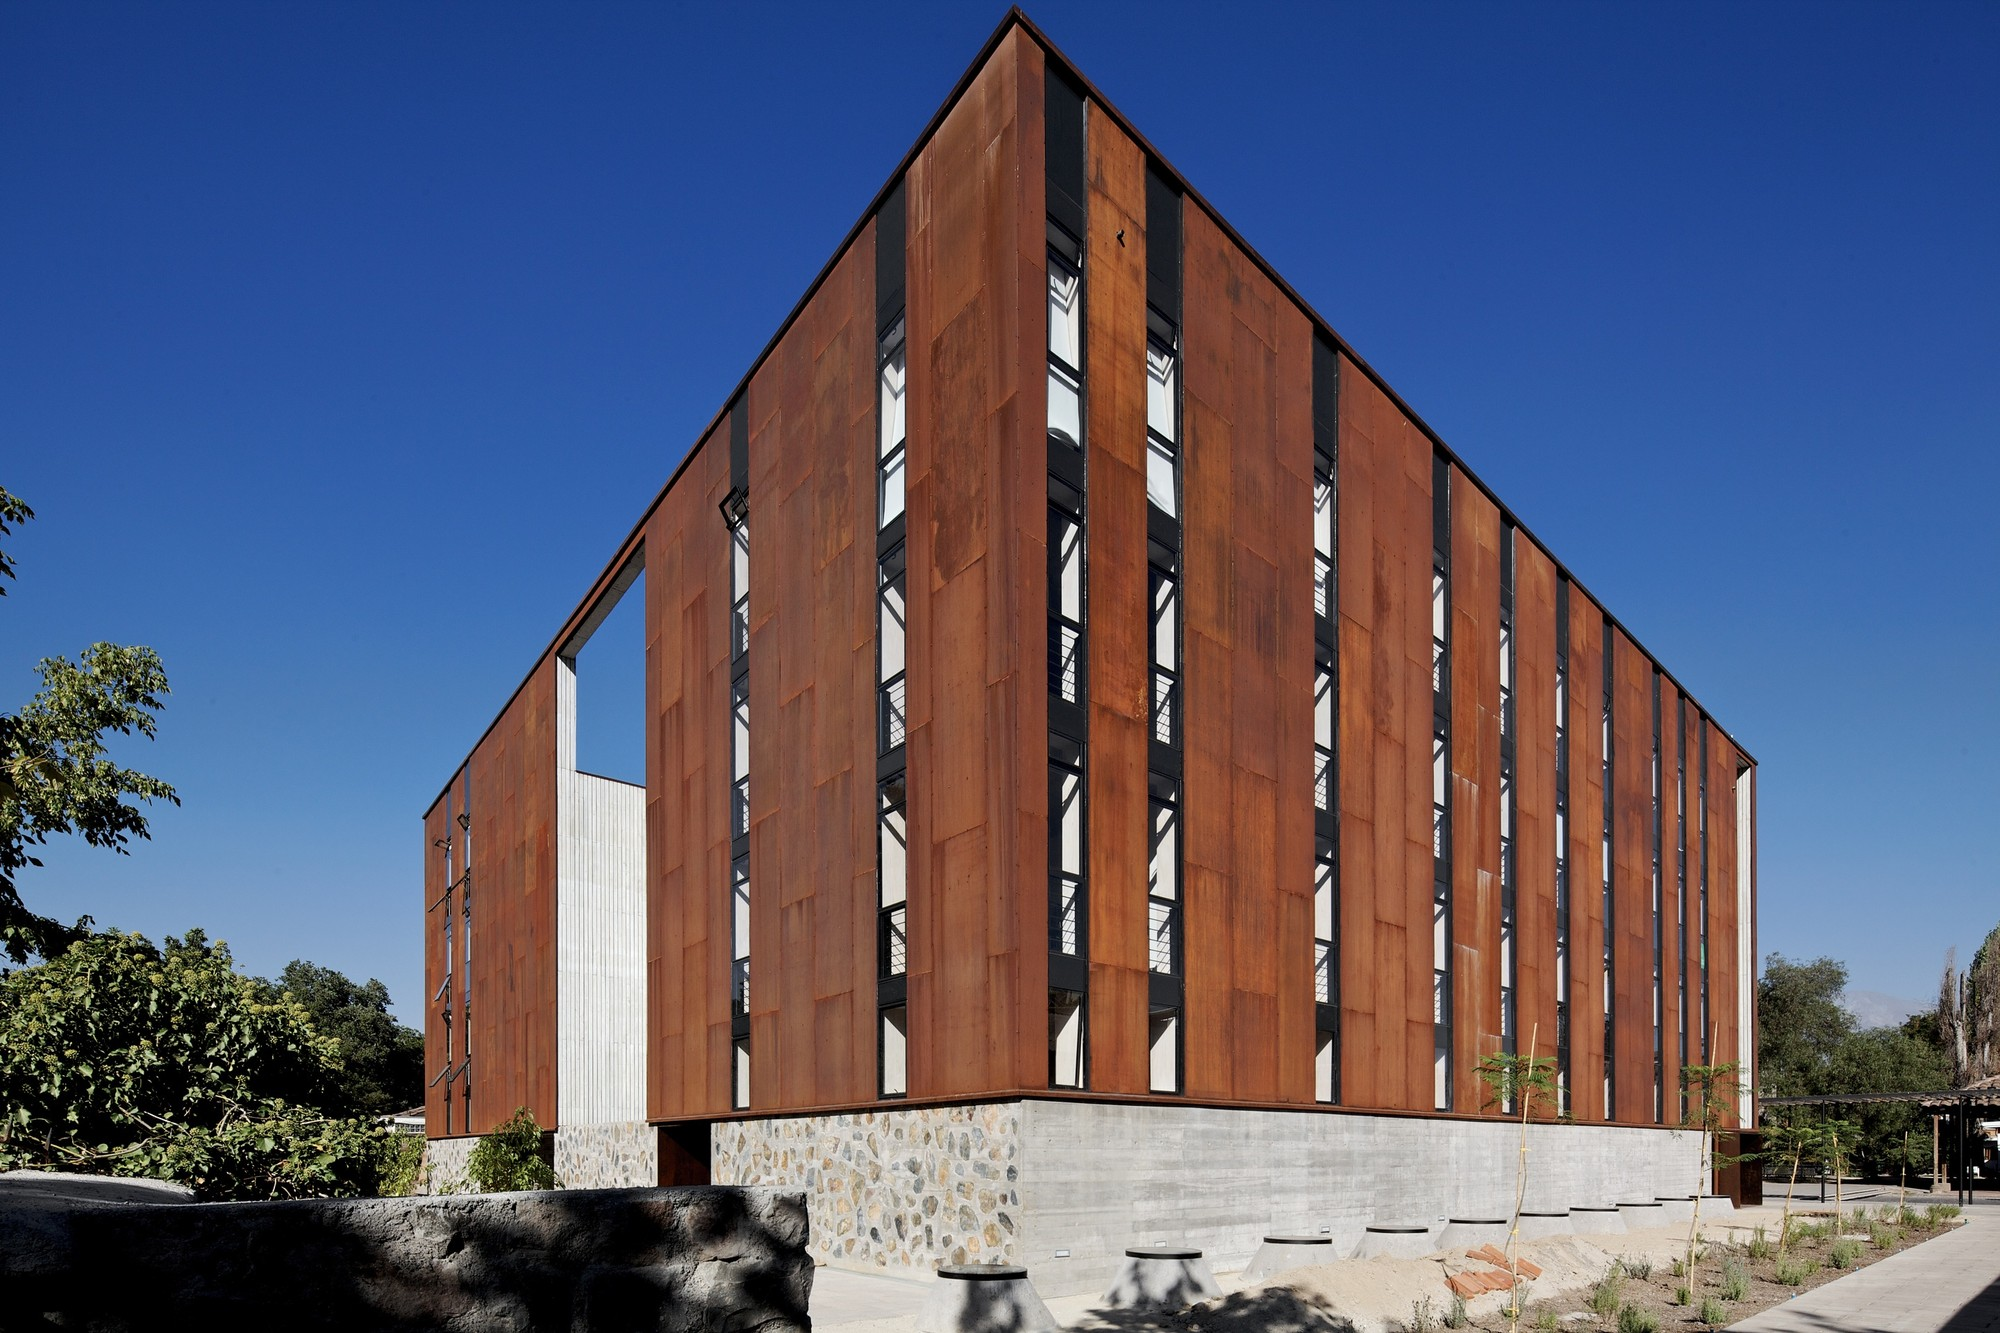 School of Design and Institute of Urban Studies / Sebastián Irarrázaval, © Nico Saieh